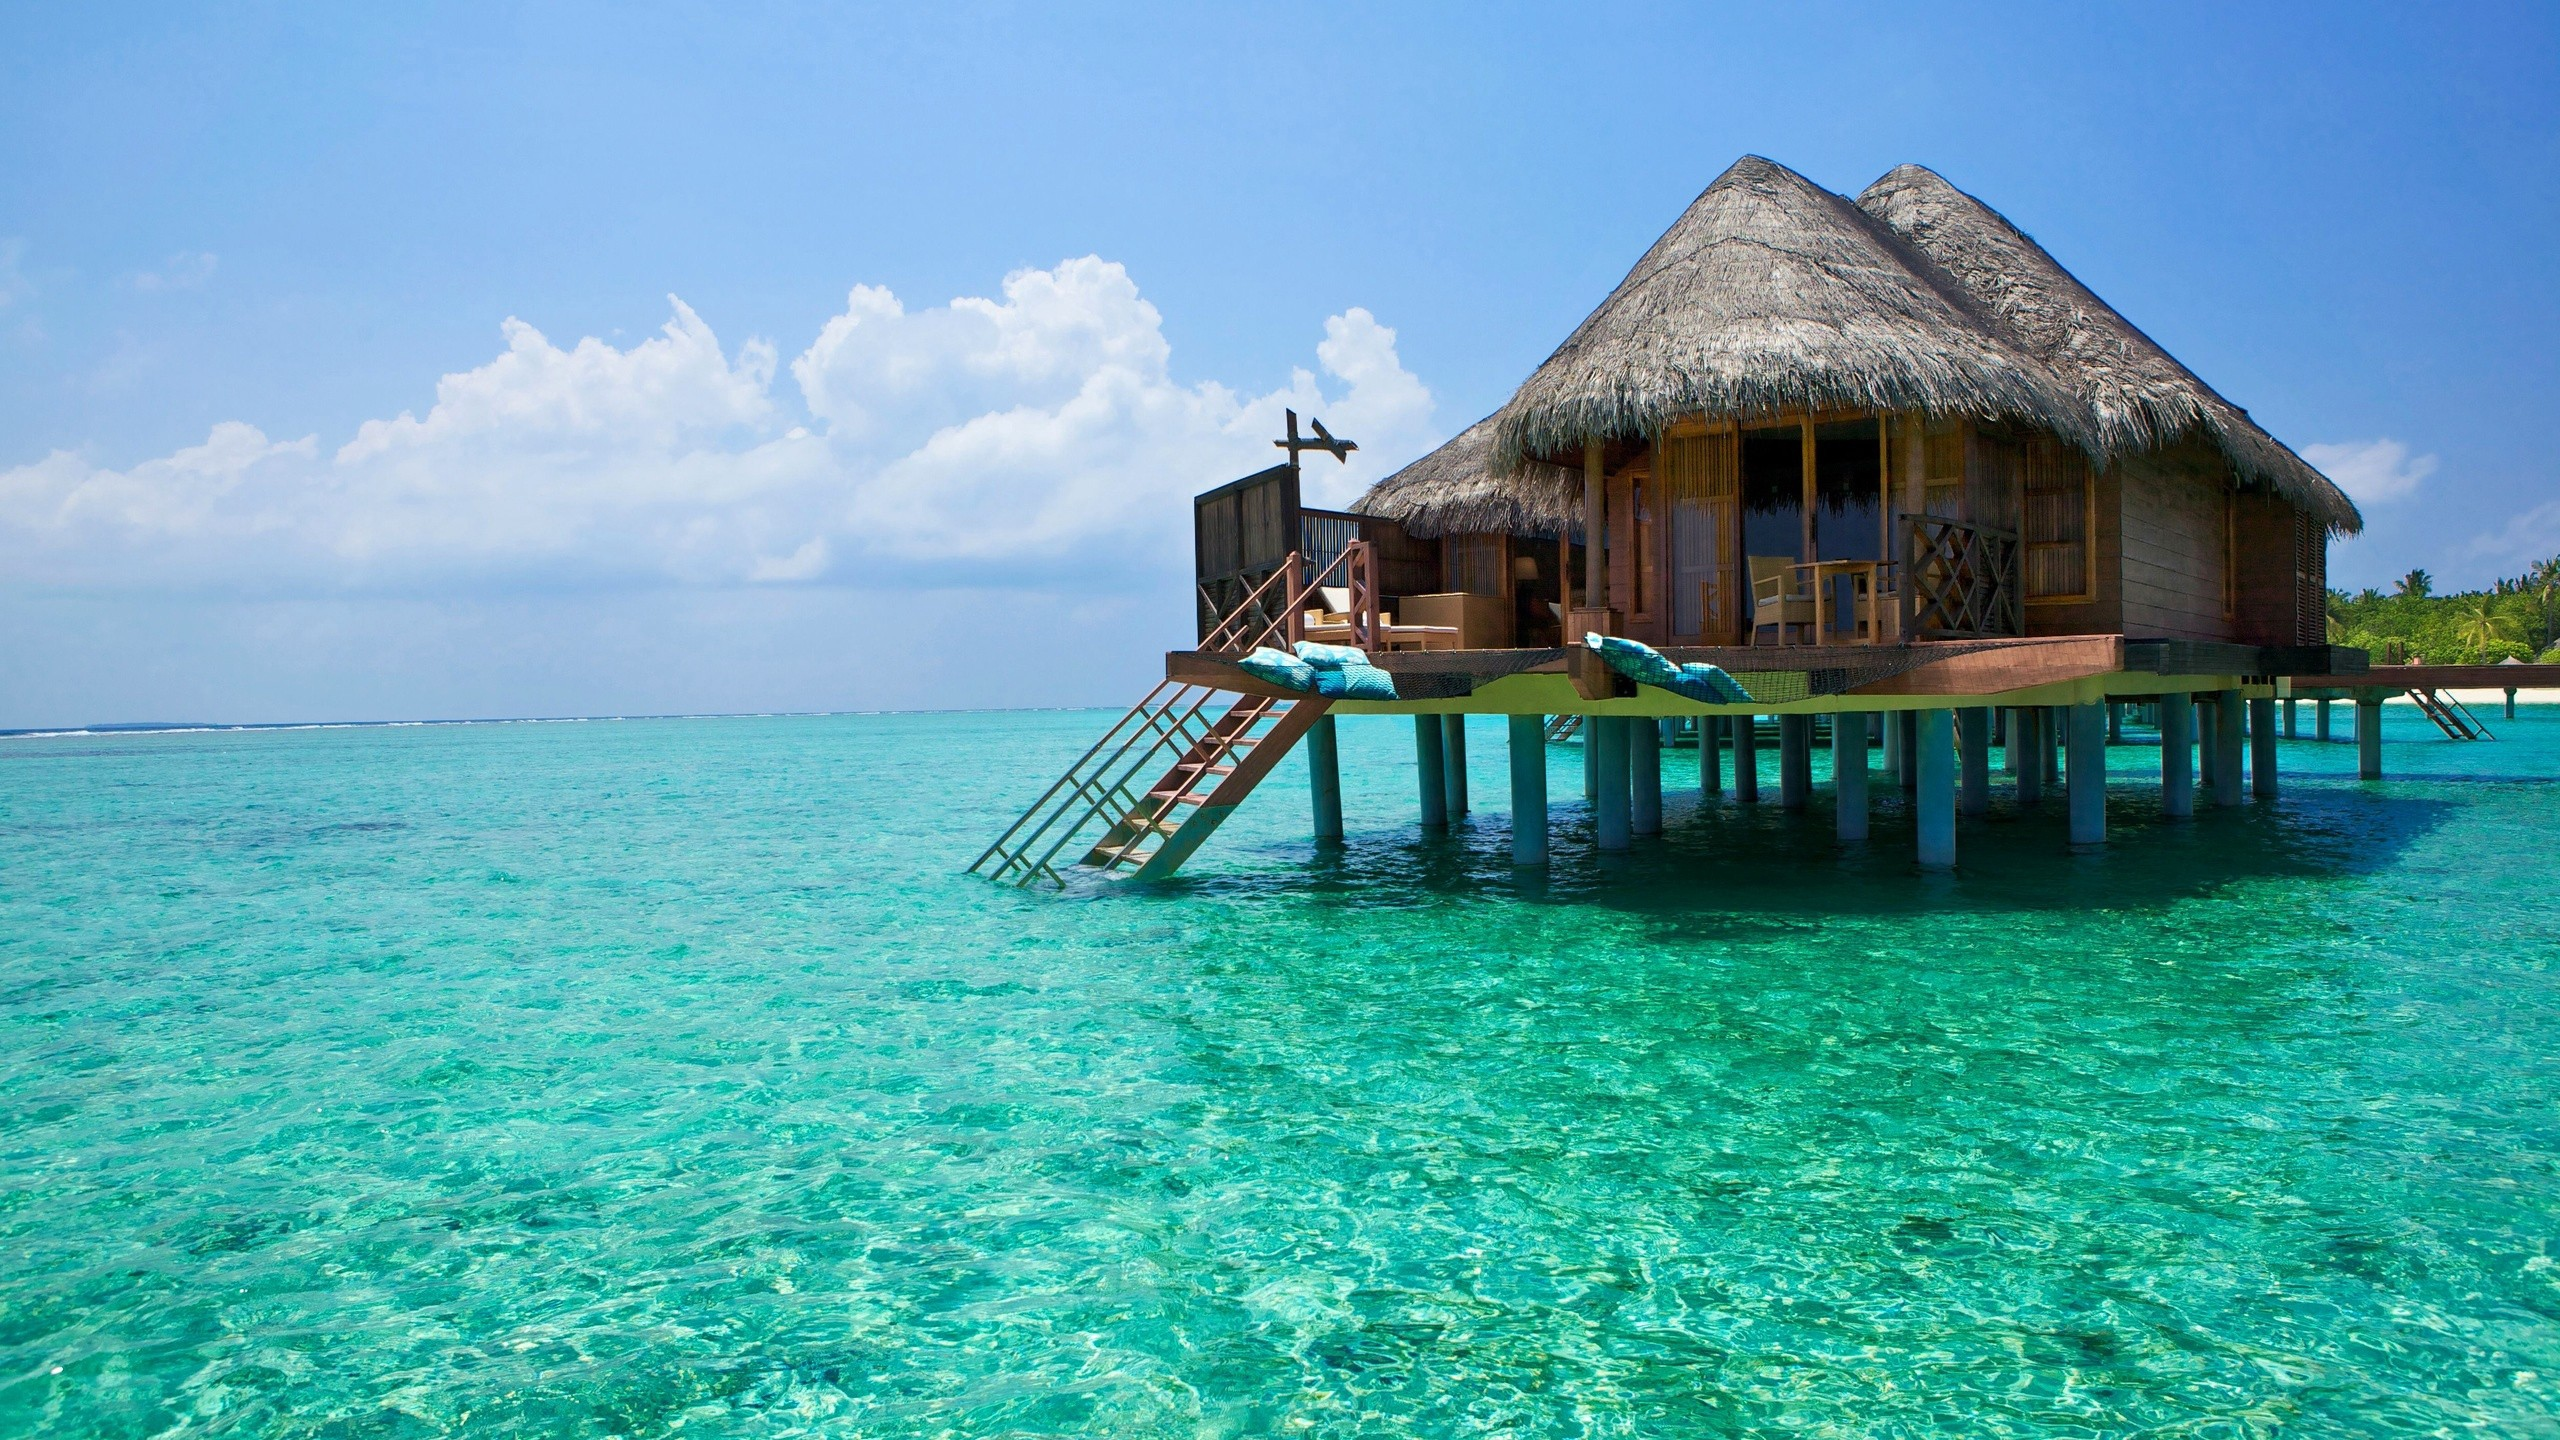 bali_island_ocean_bungalows_96267_2560x1440